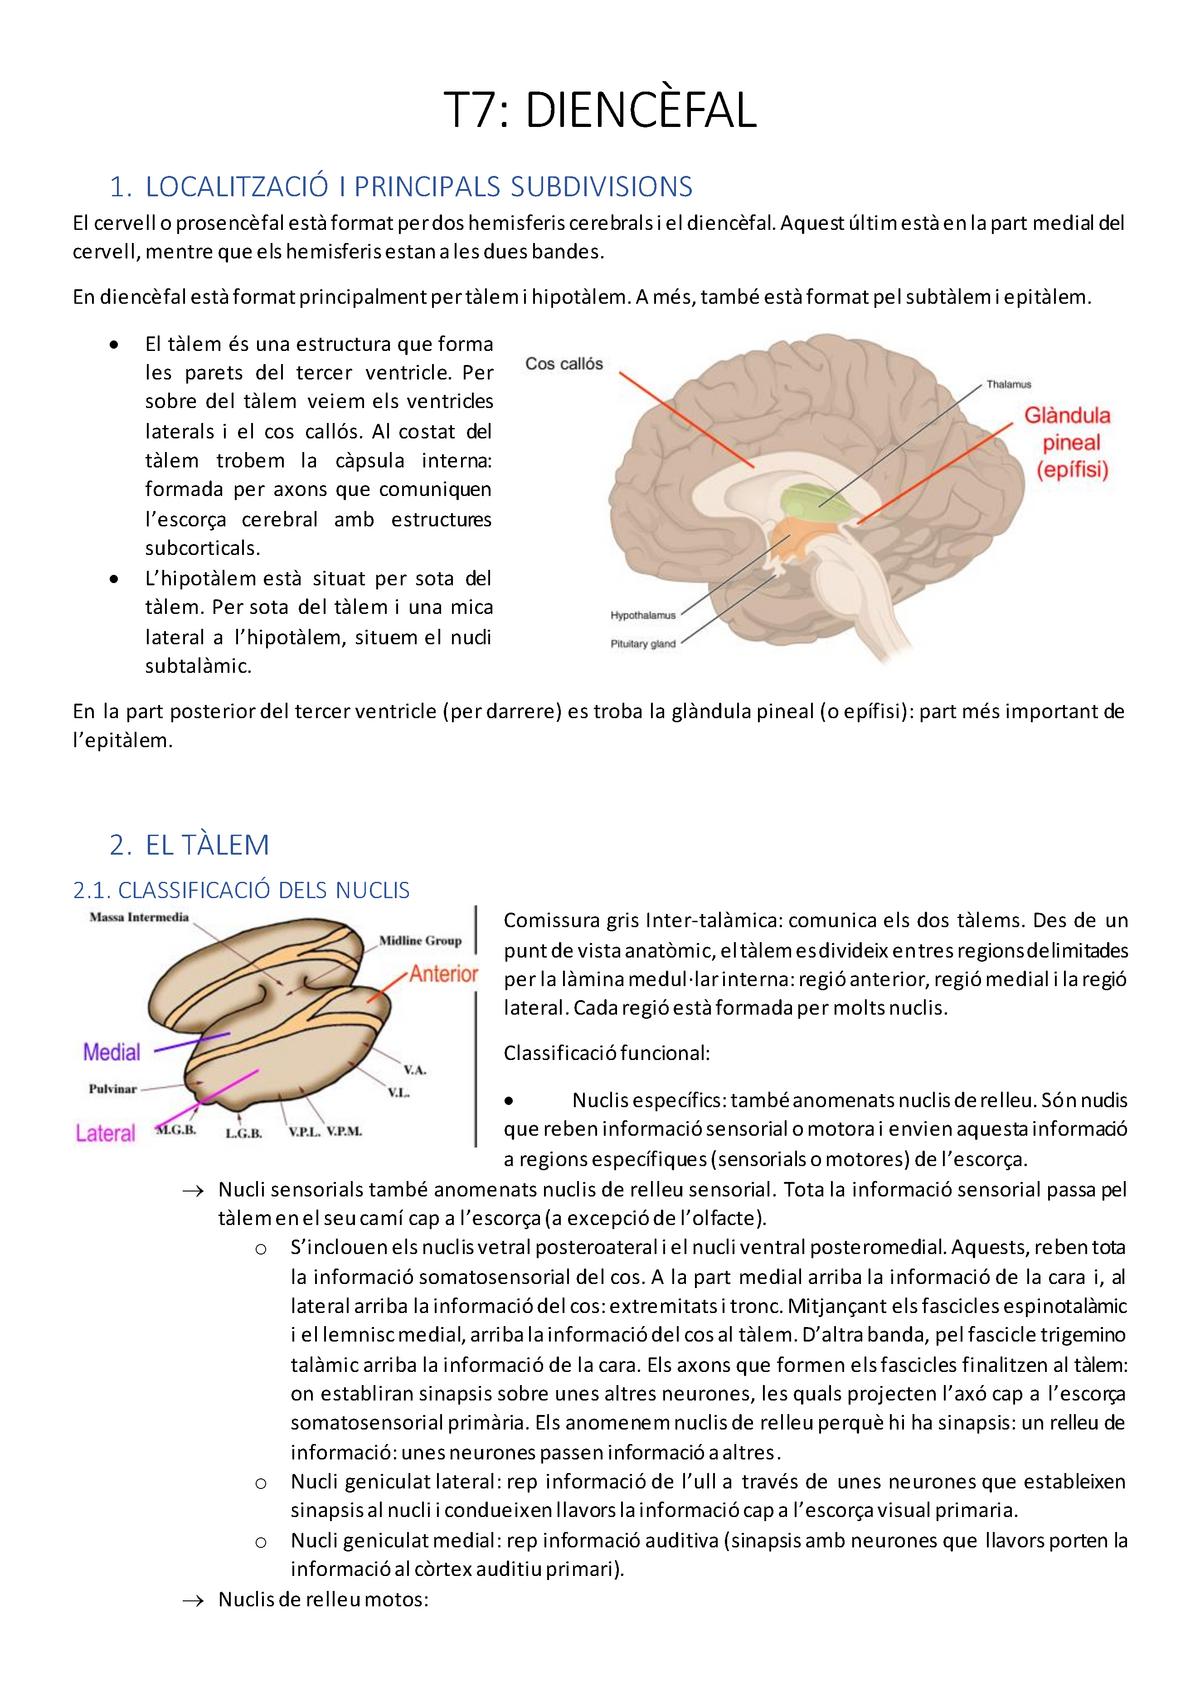 T7 Diencèfal Fonaments De Psicobiologia Ii Neuroanatomia